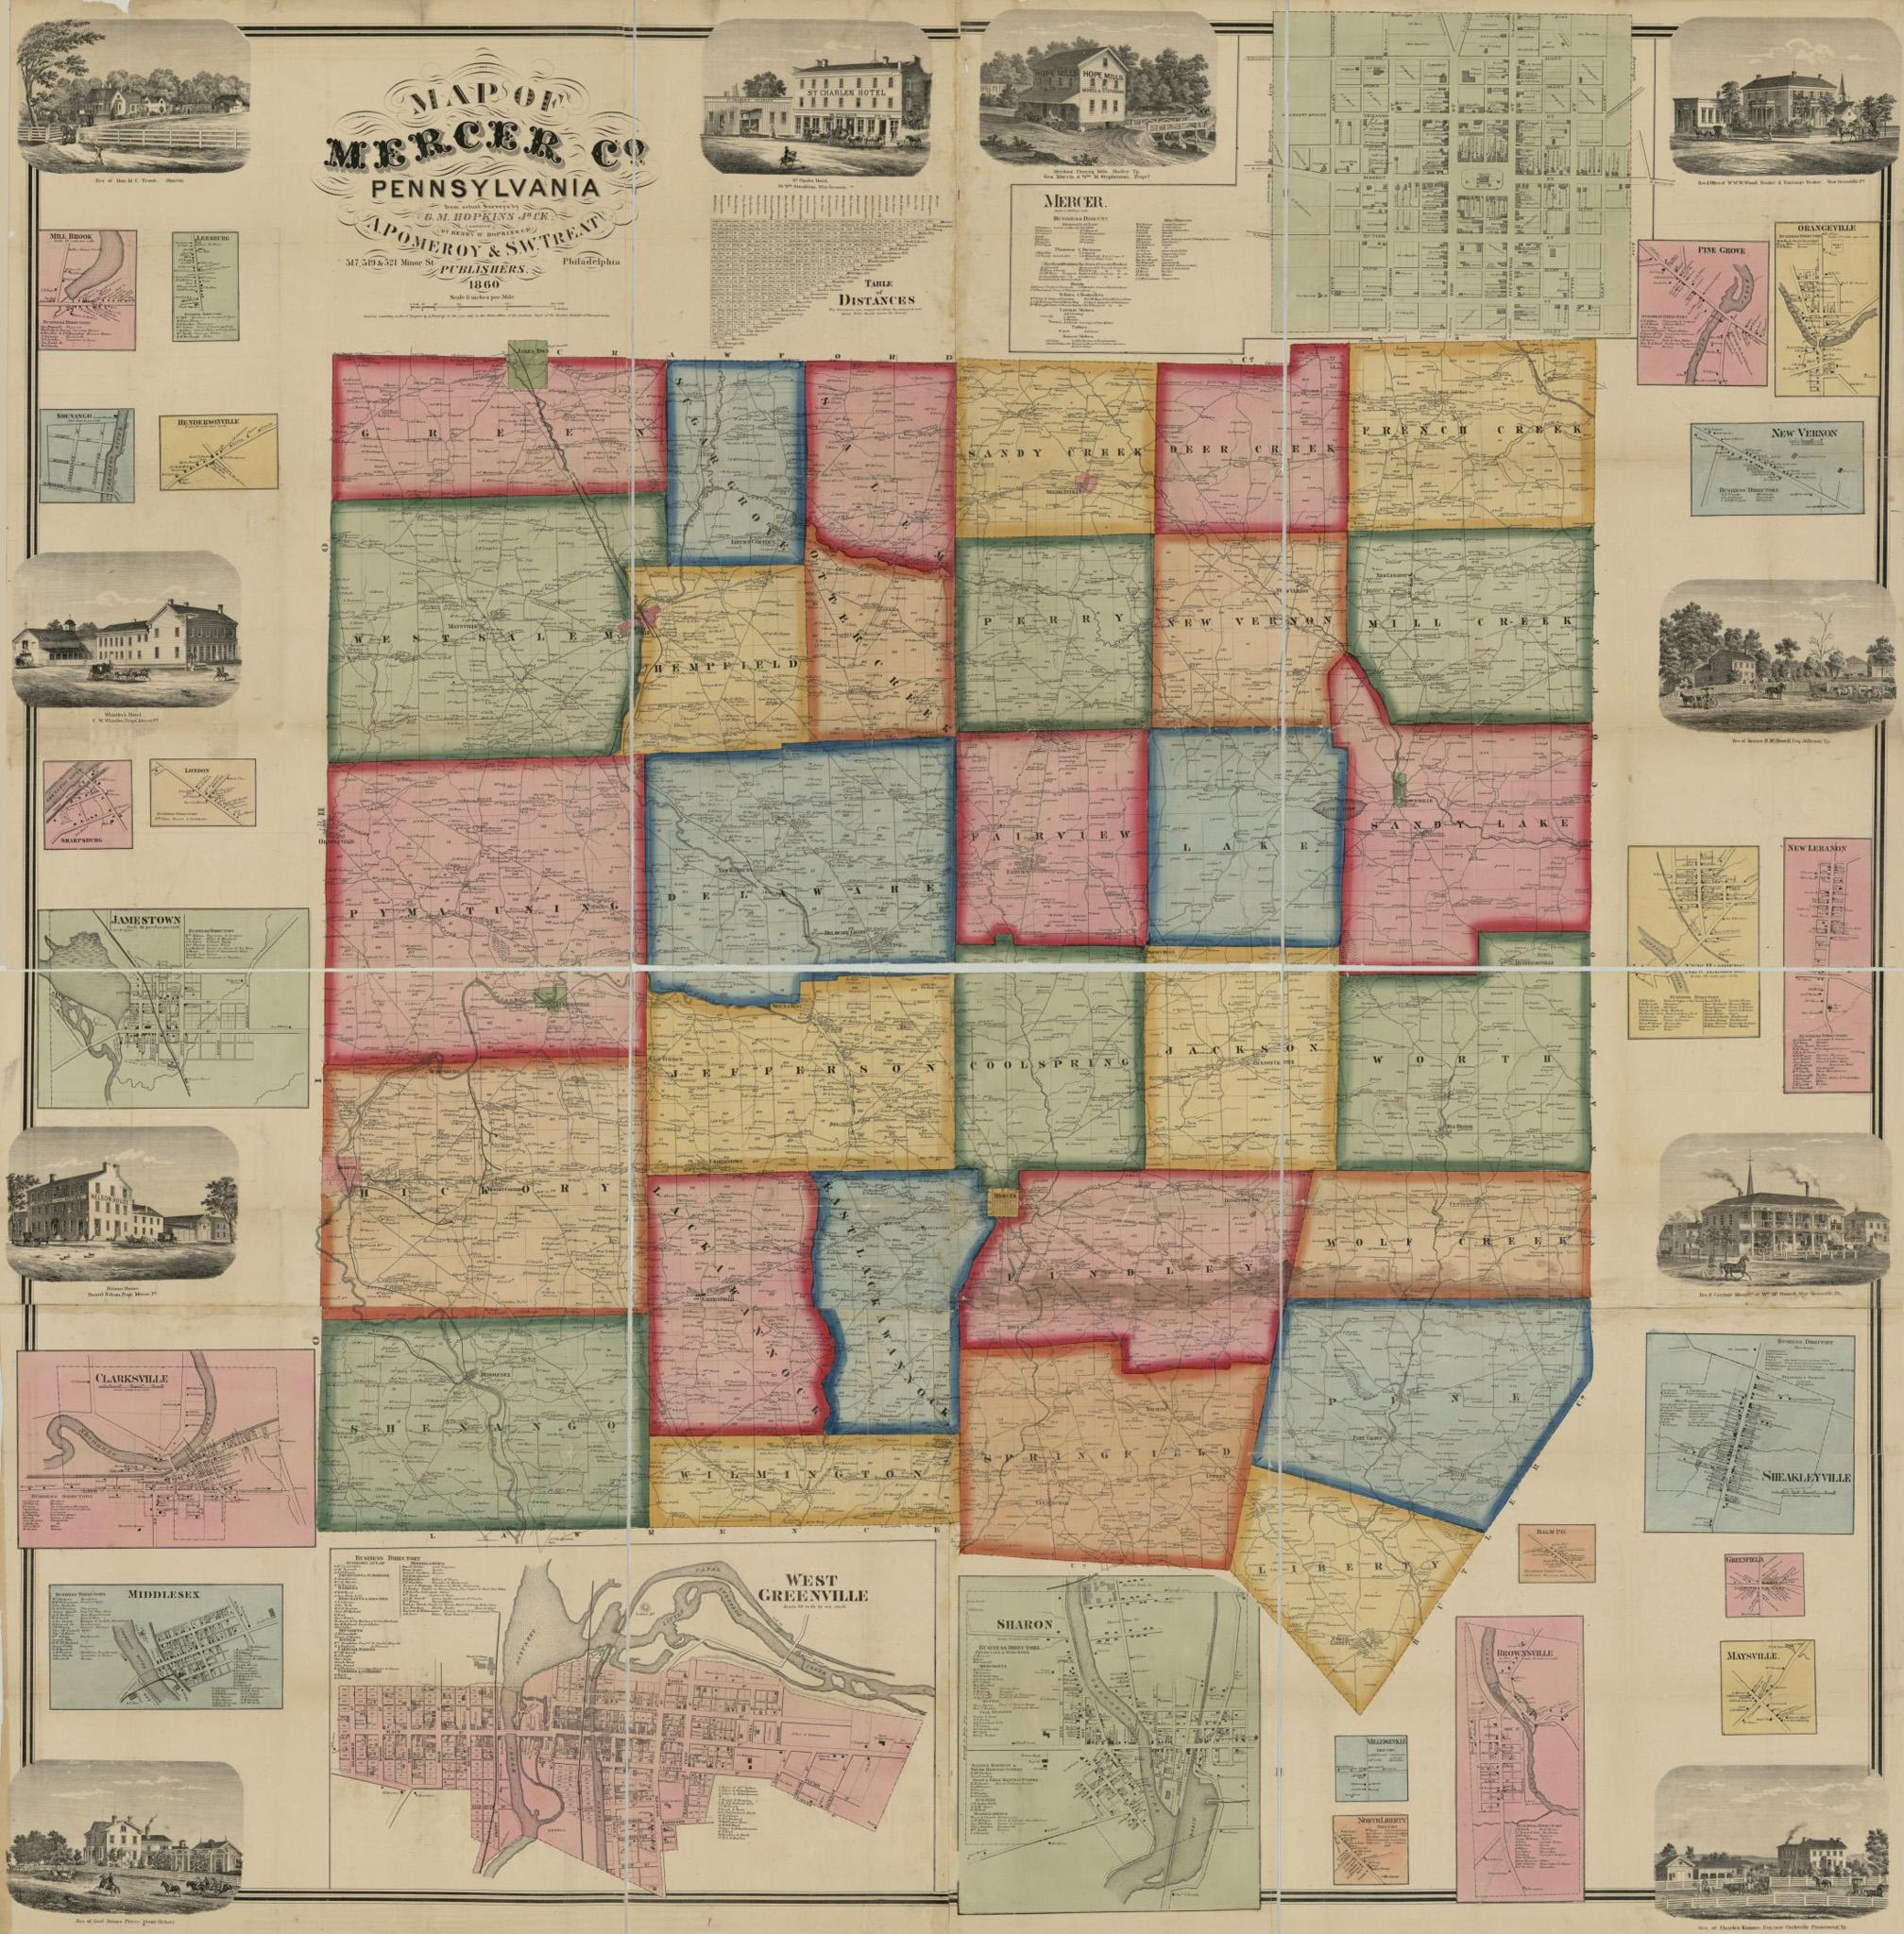 1860 Mercer County Map